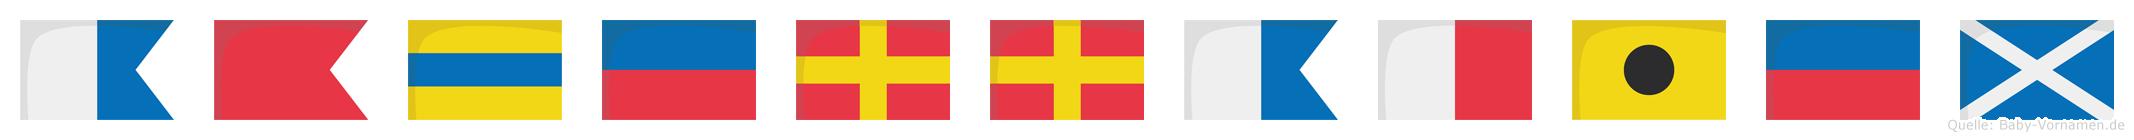 Abderrahiem im Flaggenalphabet